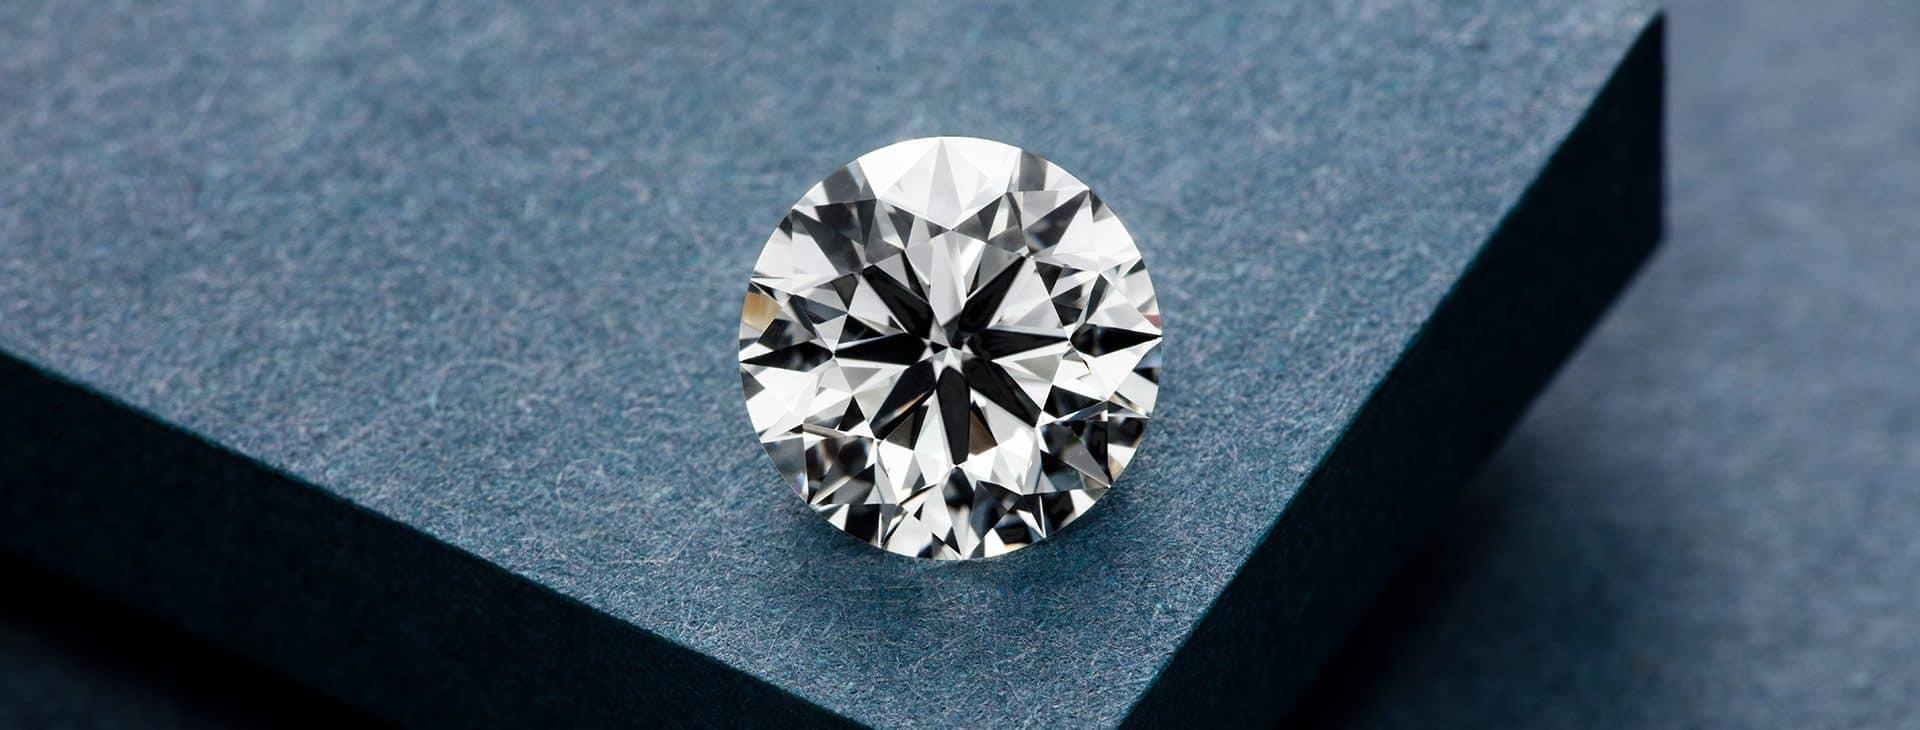 Diamanten